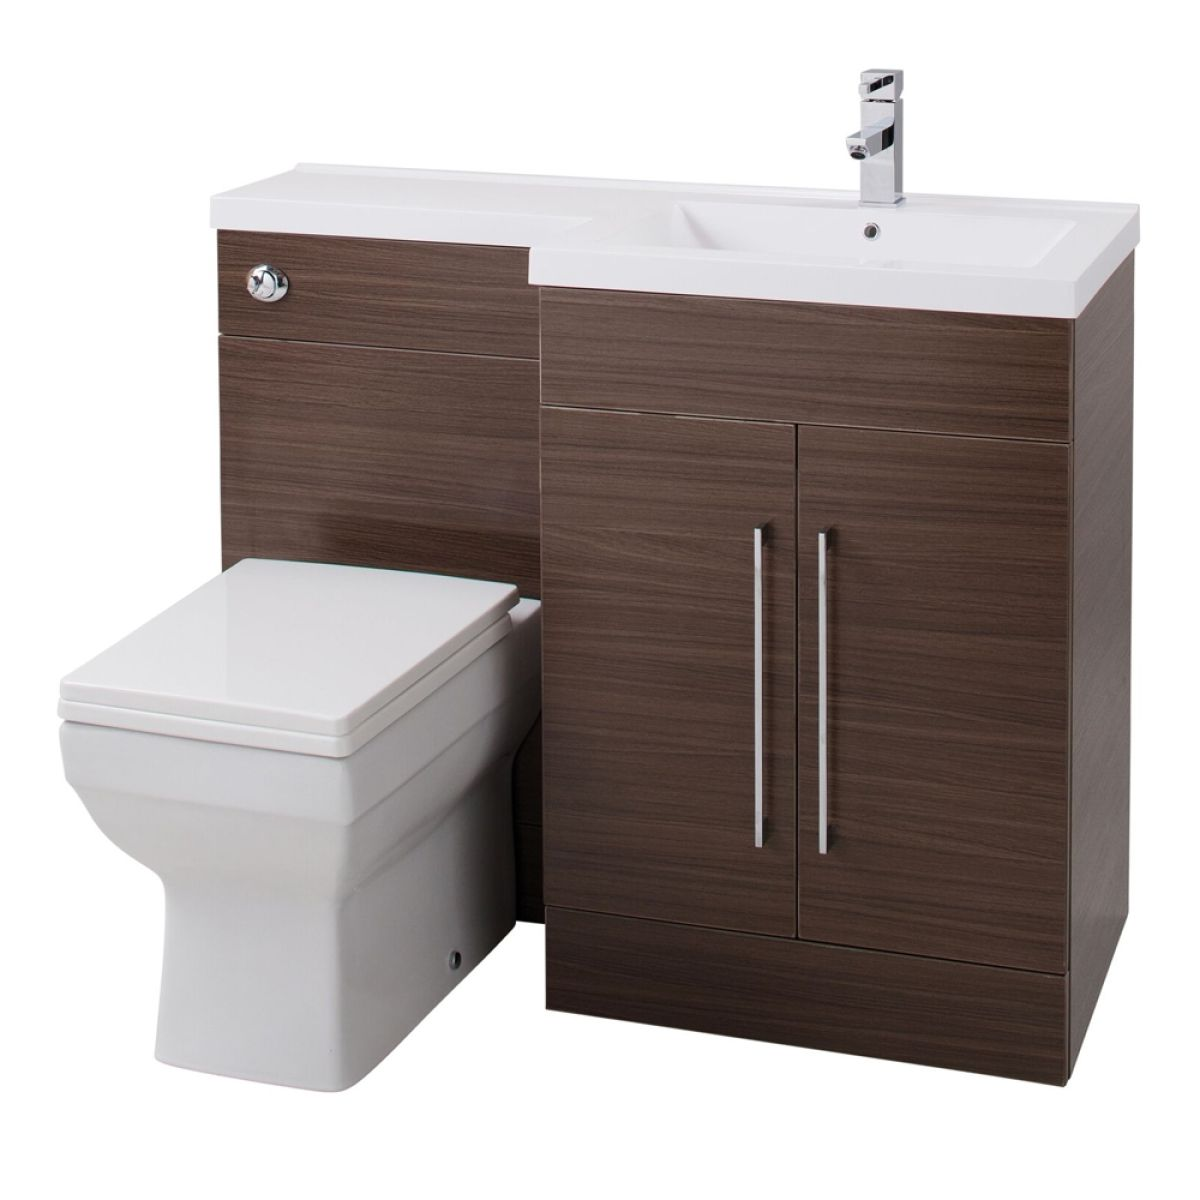 Cassellie Maze Walnut L-Shape Combination Furniture Pack